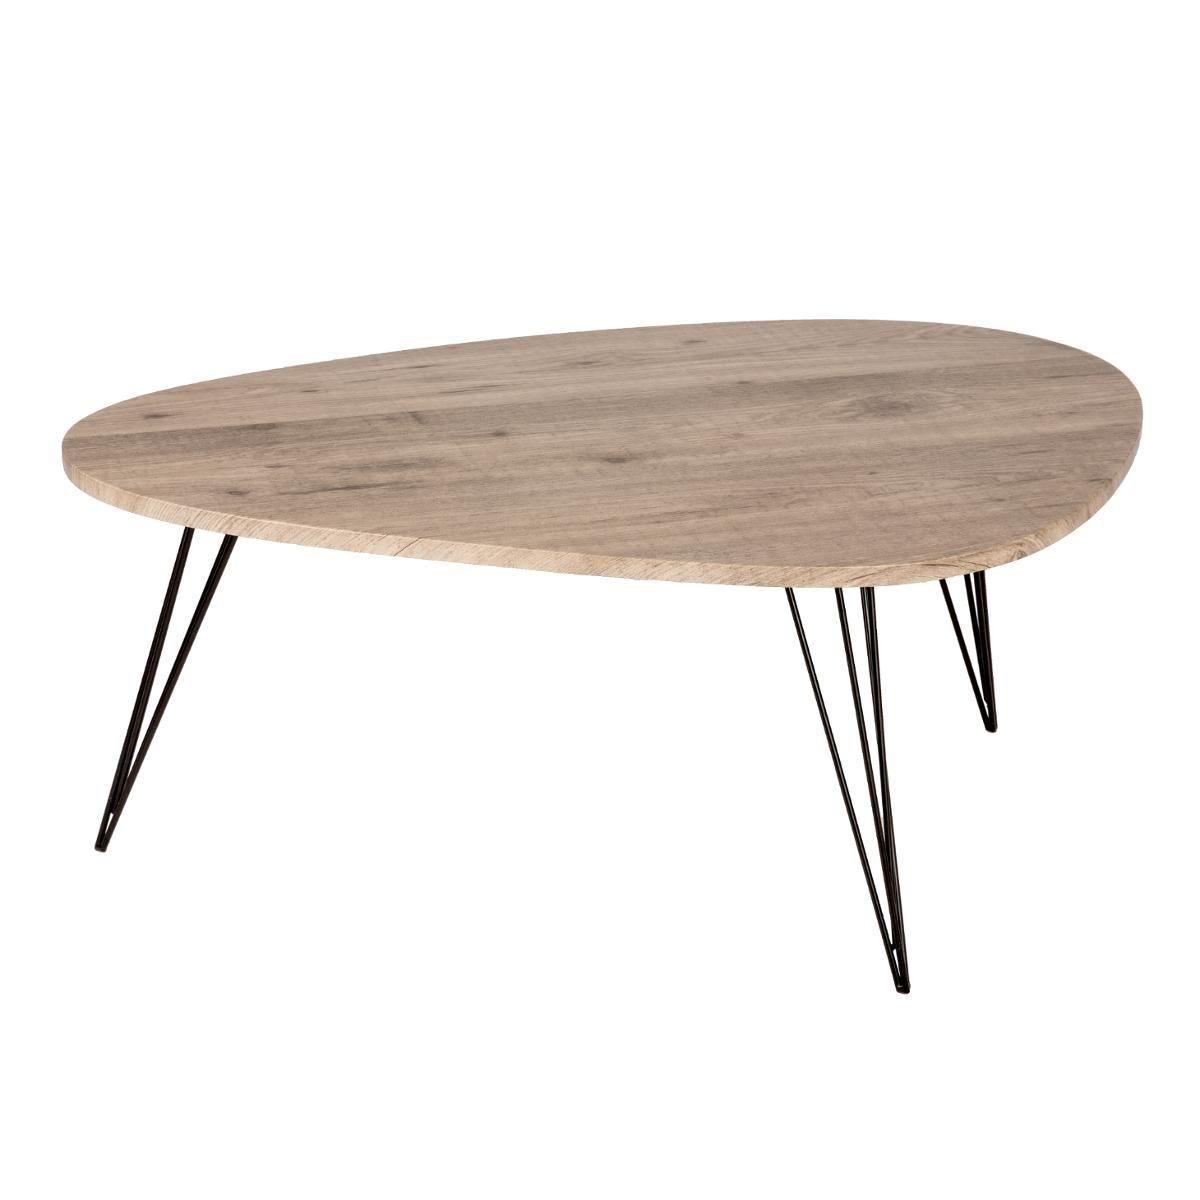 Table Basse Neile En 2020 Table Basse Table Basse Jimi Table Bois